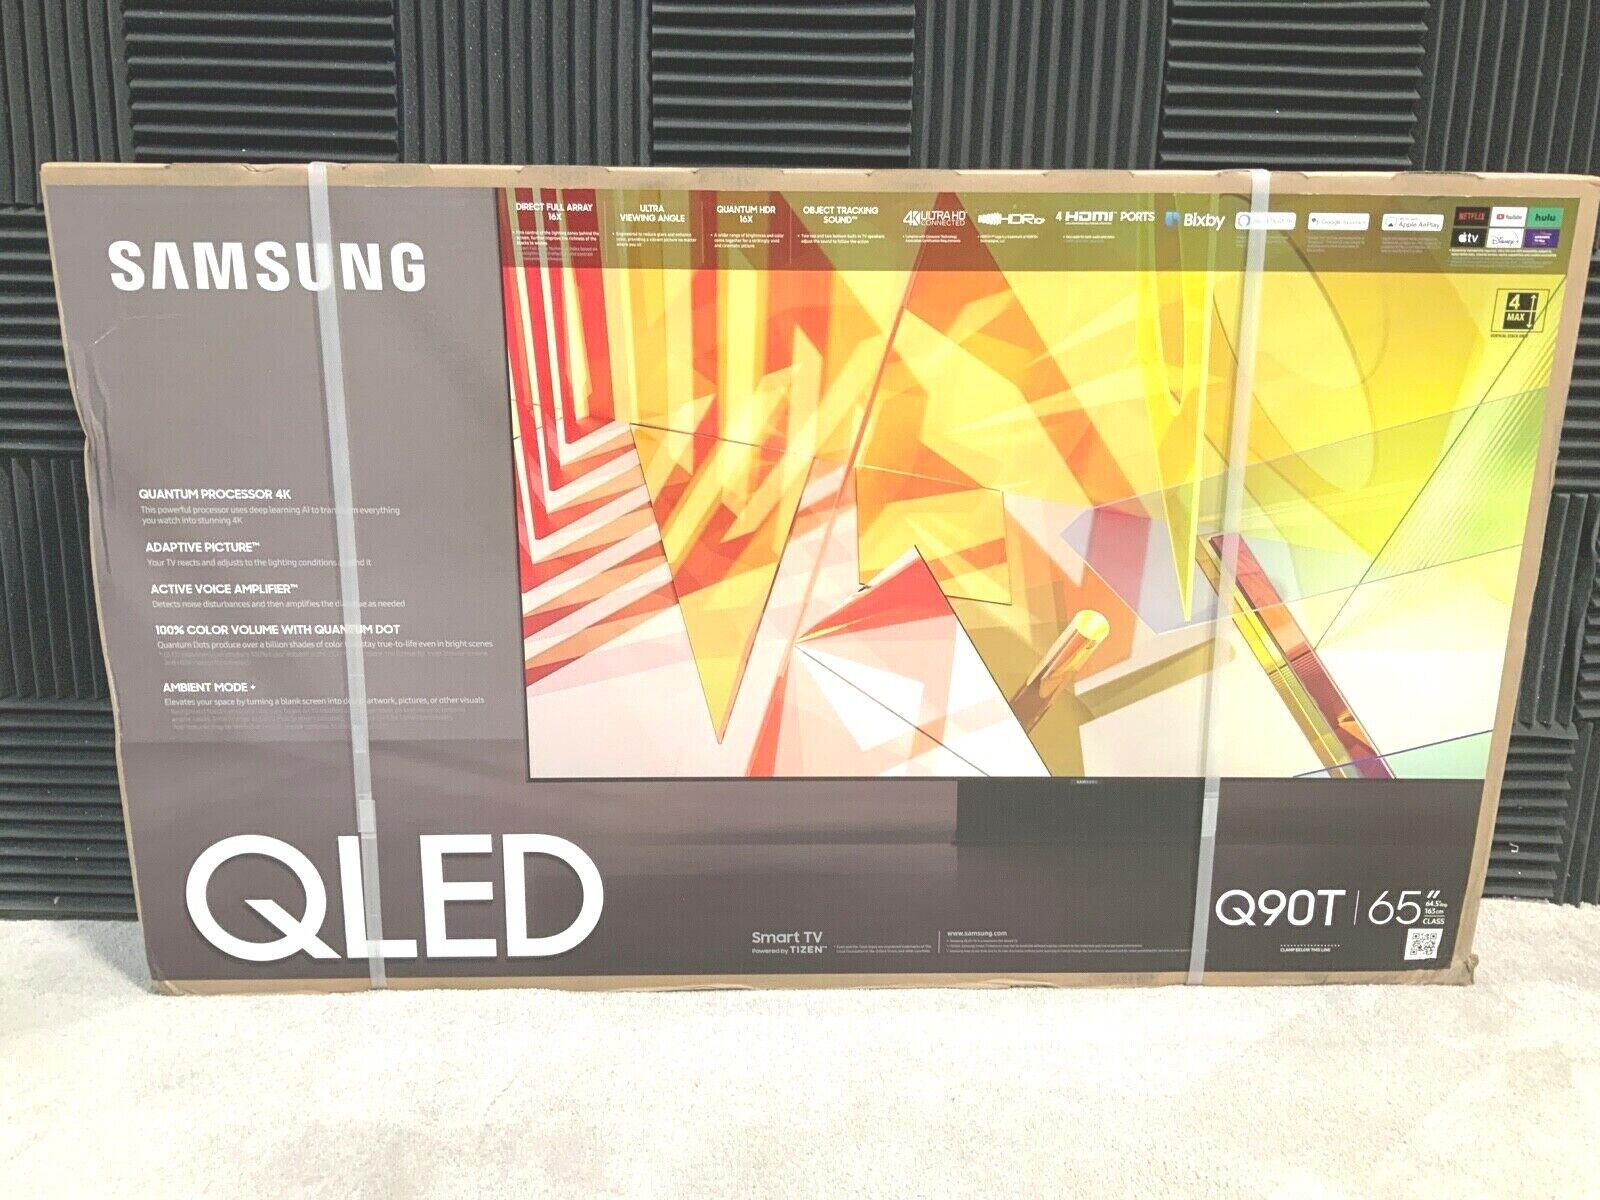 NEW Samsung QN65Q90TA QLED 65 Quantum 4K UHD HDR Smart TV QN65Q90TAFXZA 2020. Available Now for 1649.99